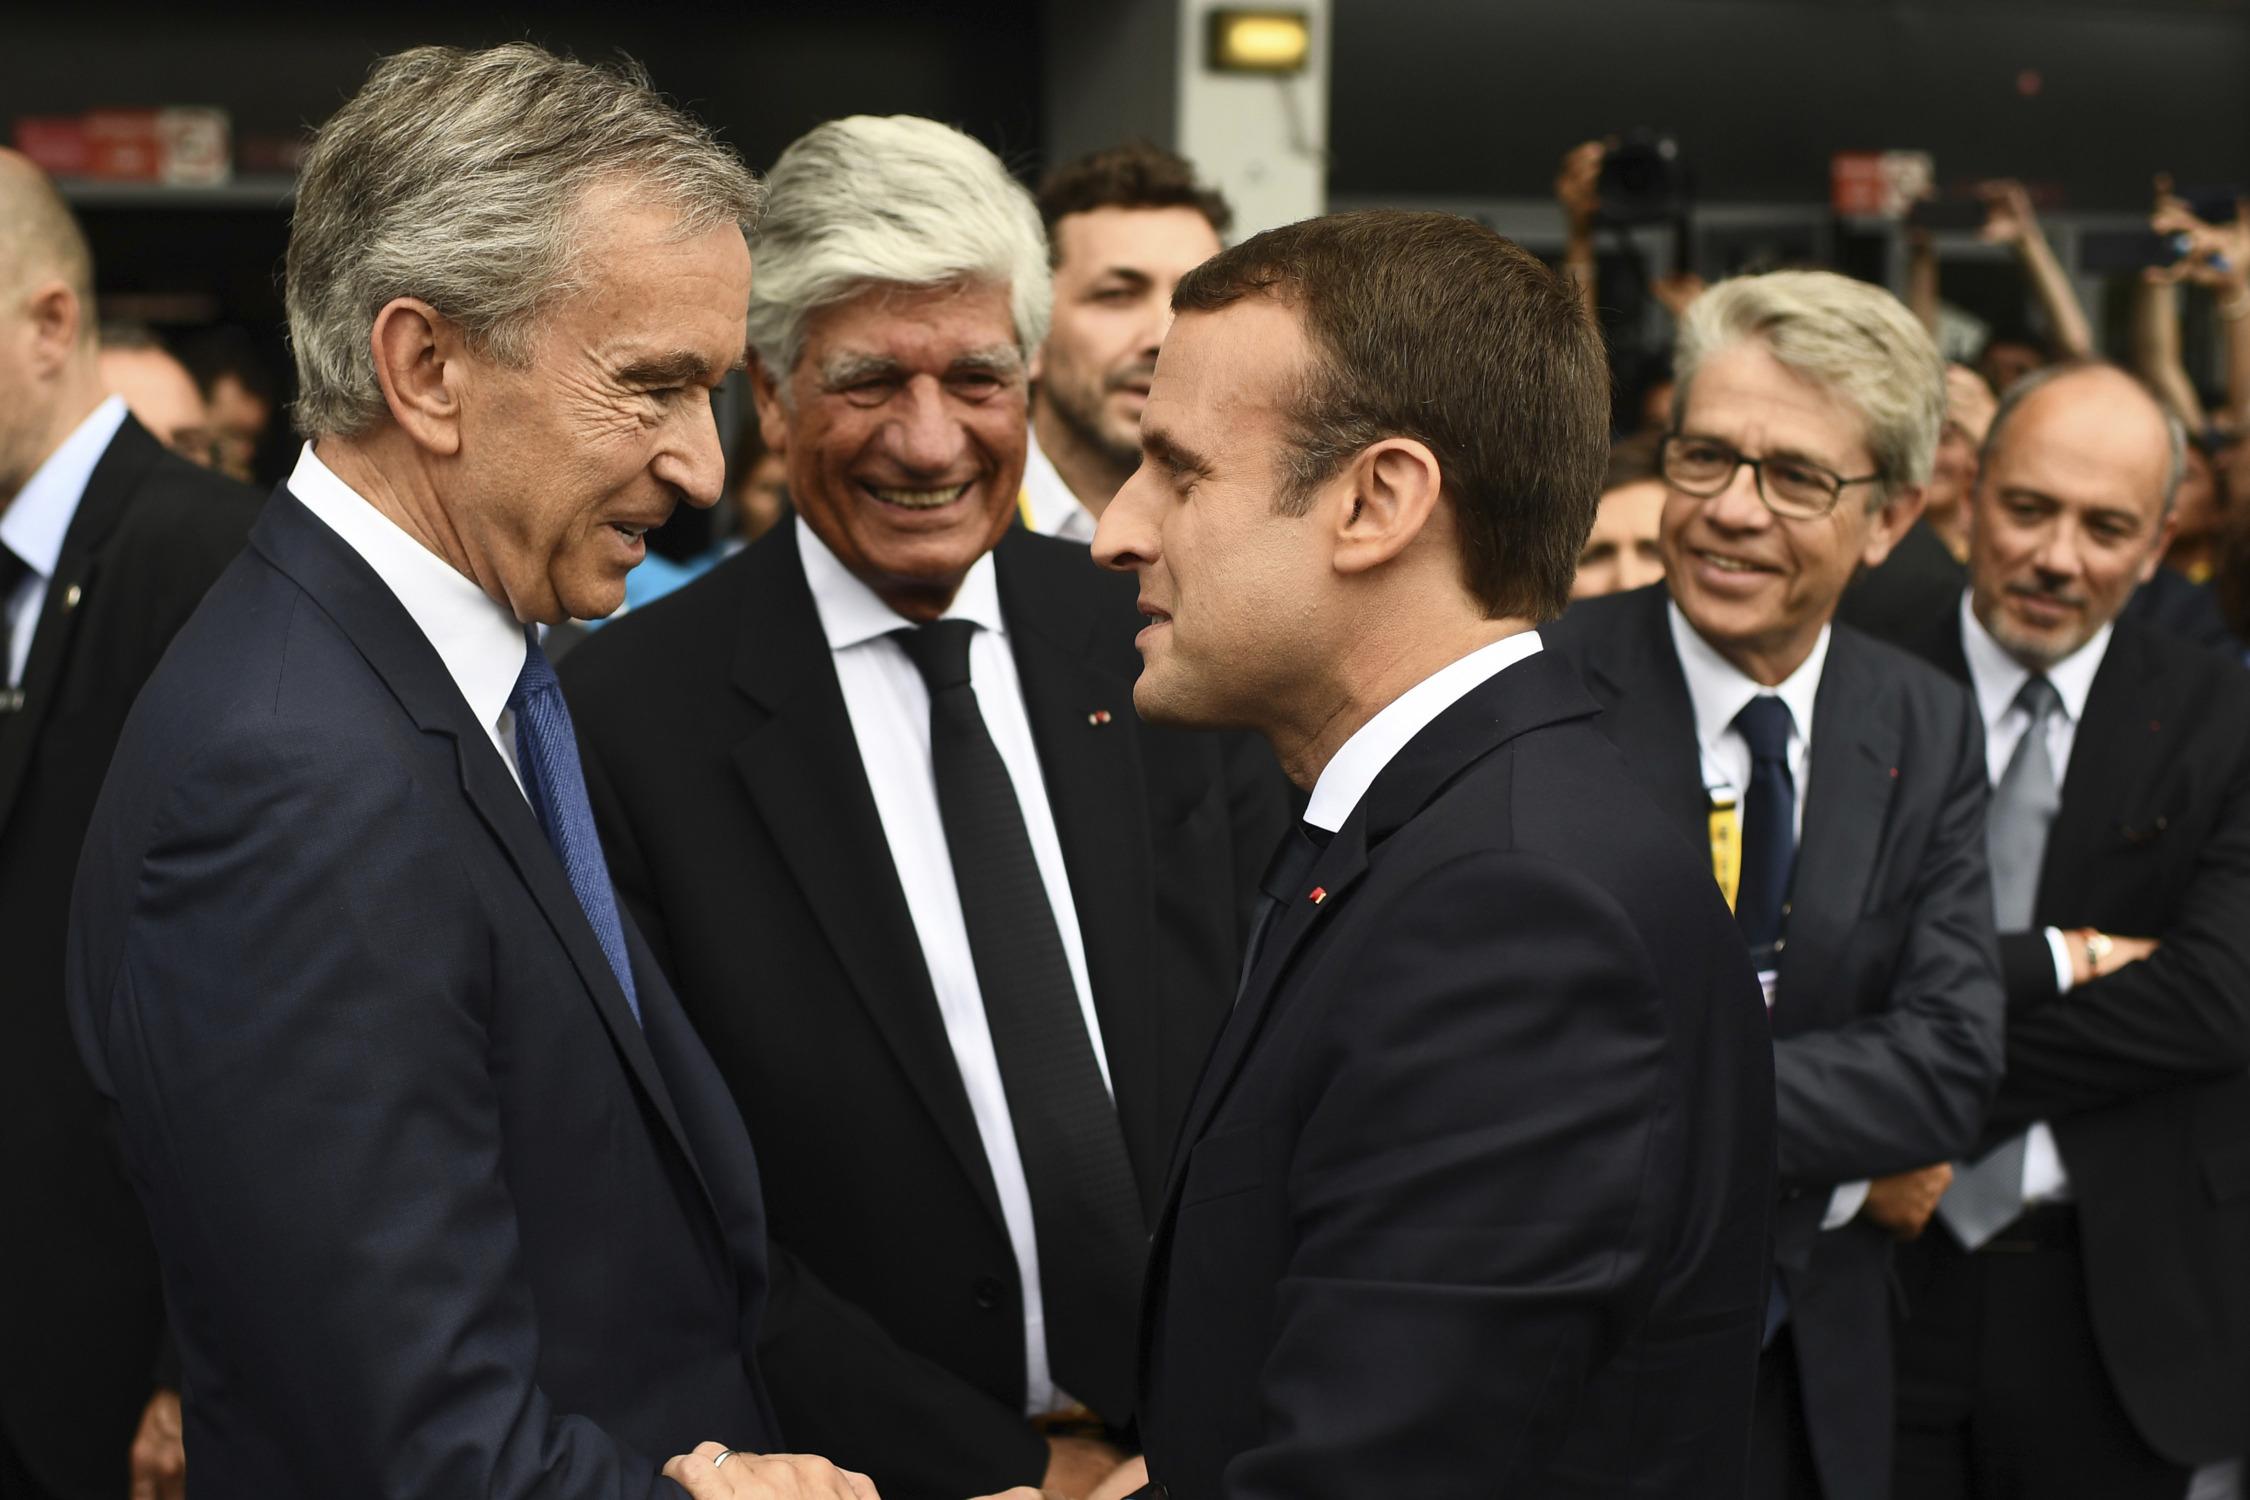 LVMH Group CEO Bernard Arnault (left) shakes the hand of French President Emmanuel Macron (right) at Vivatech // Image:Martin Bureau/Pool Photo via AP